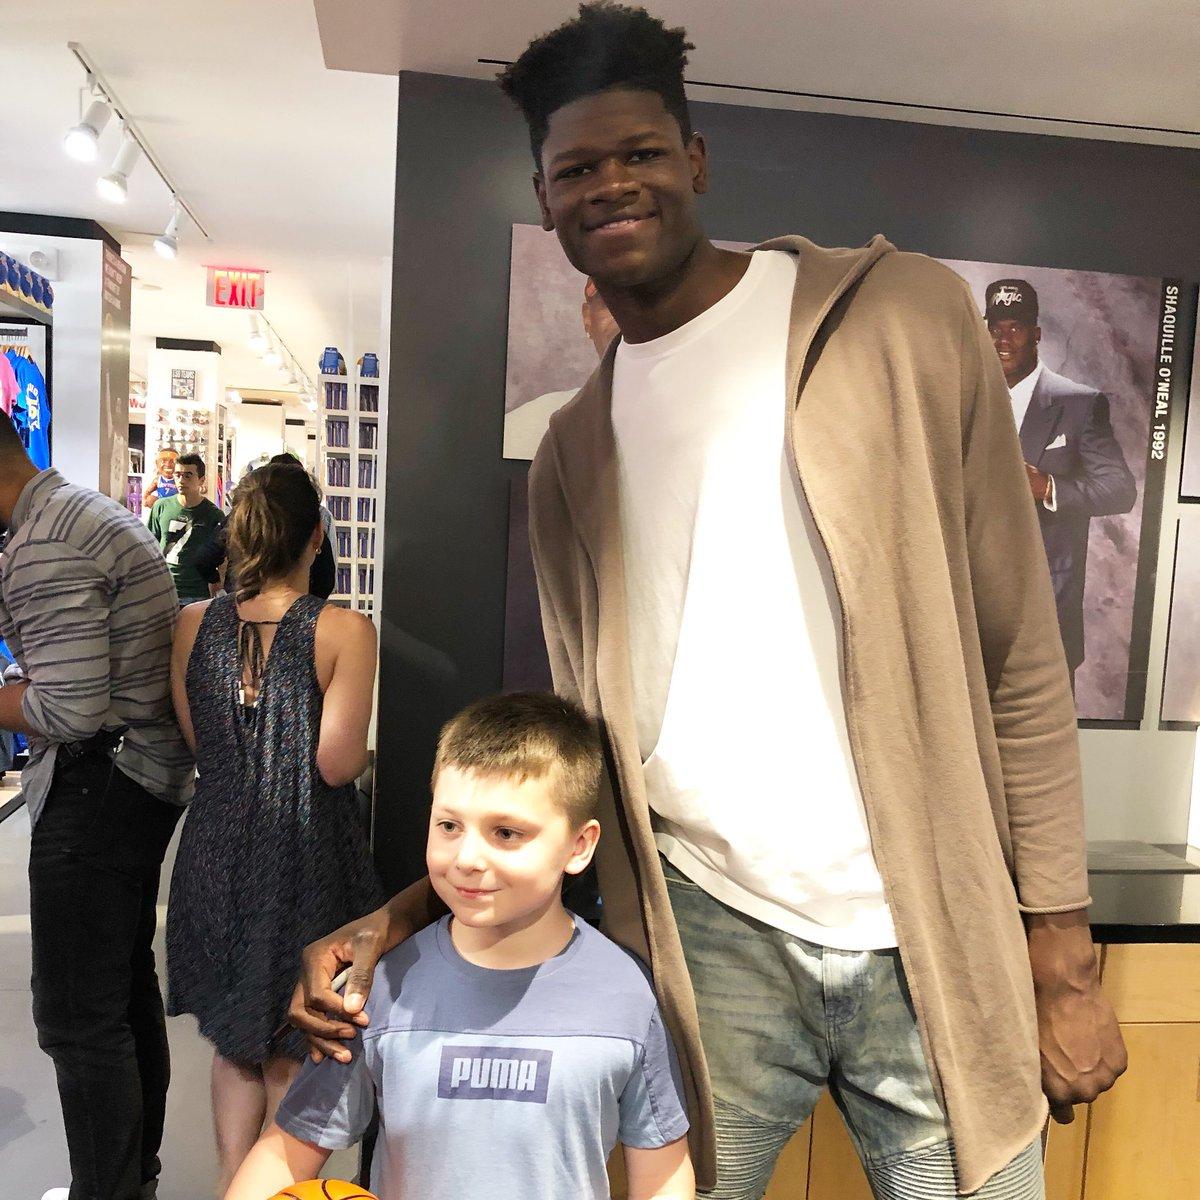 Mo Bamba makes some new friends at the @NBASTORE! #NBADraft - Thursday at 7pm/et